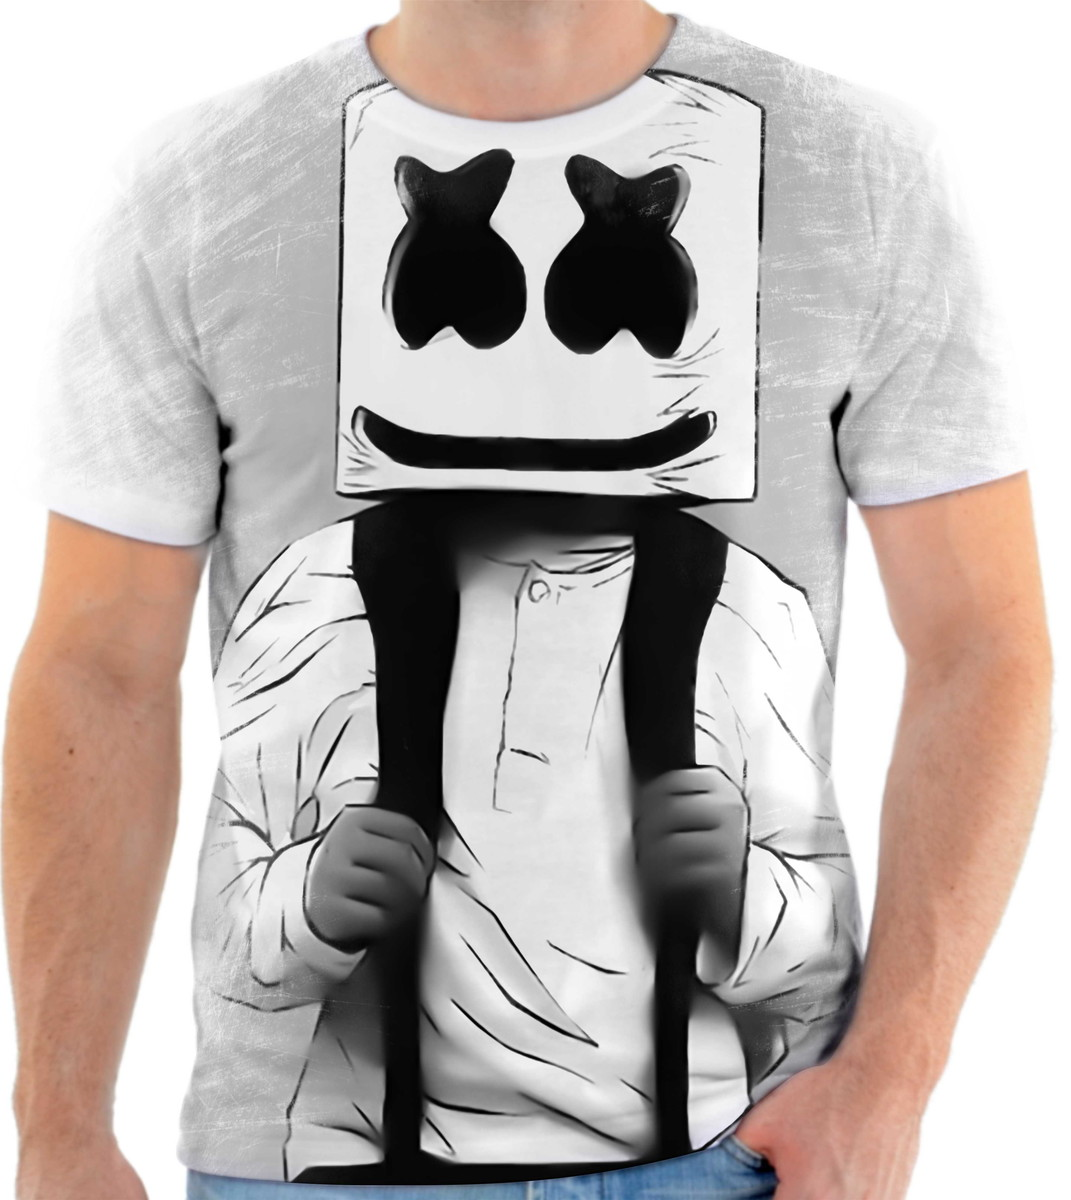 camisa camiseta personalizada produtor marshmello dj 5 no elo7